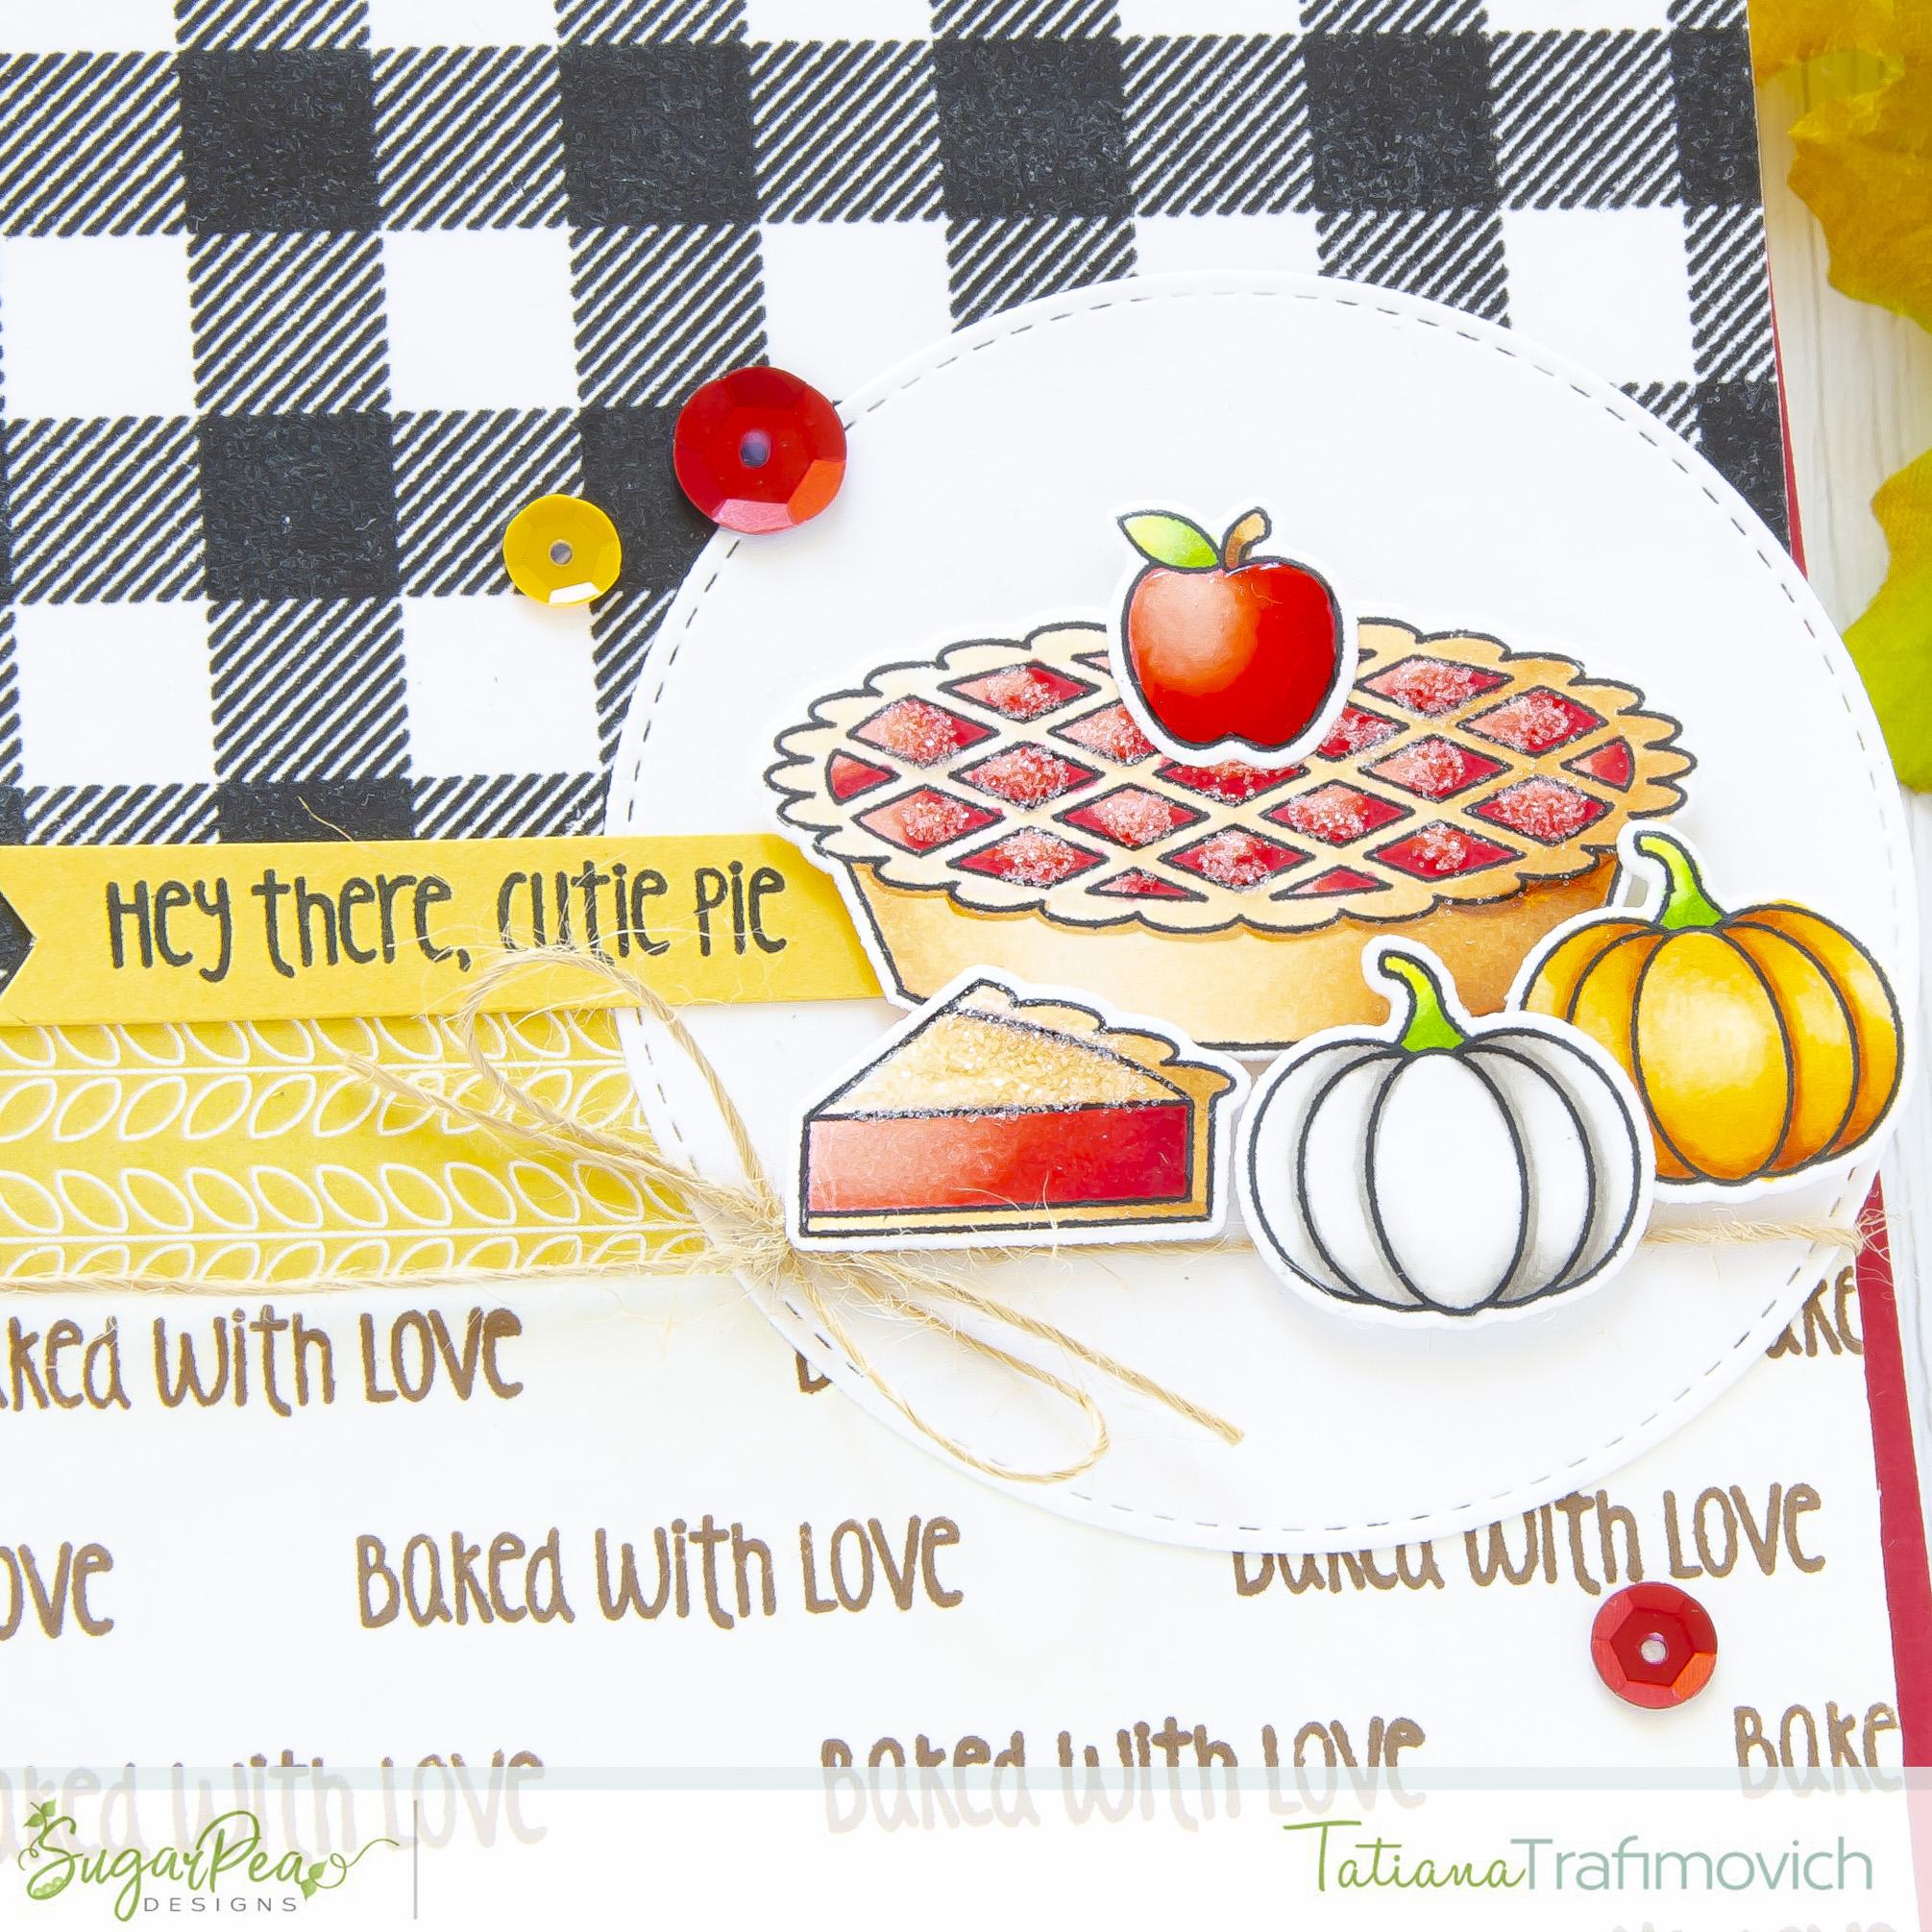 Hey There, Cutie Pie #handmade card by Tatiana Trafimovich #tatianacraftandart - Sweet As Pie stamp set by SugarPea Designs #sugarpeadesigns